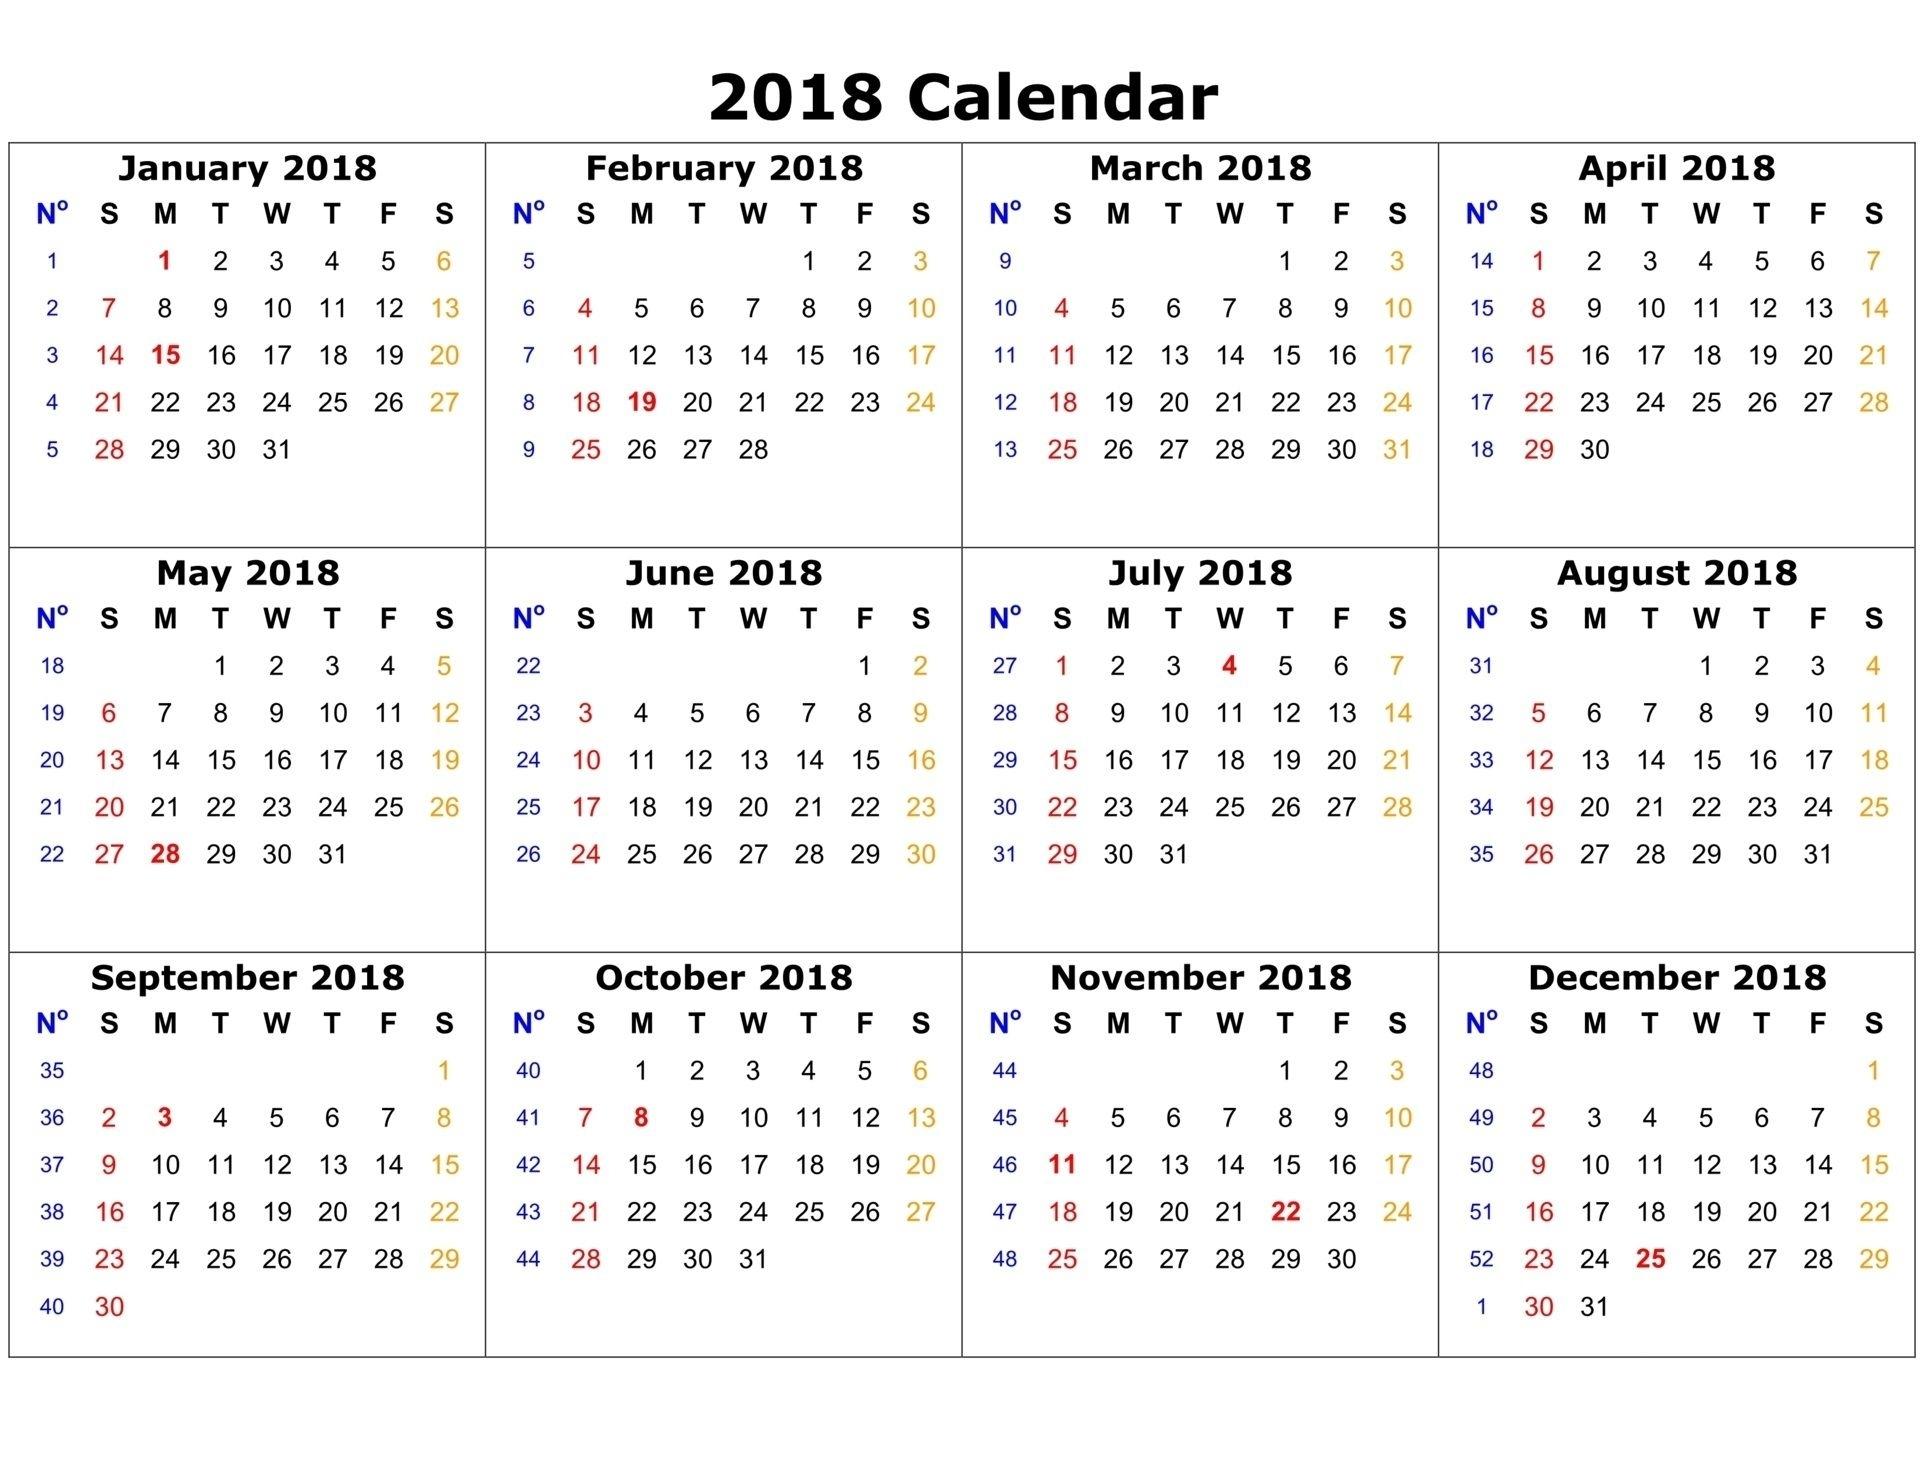 Free Printable Calendar 2018 | Printable Calendar | 2018 Calendar throughout 3 Month Printable Calendar Online